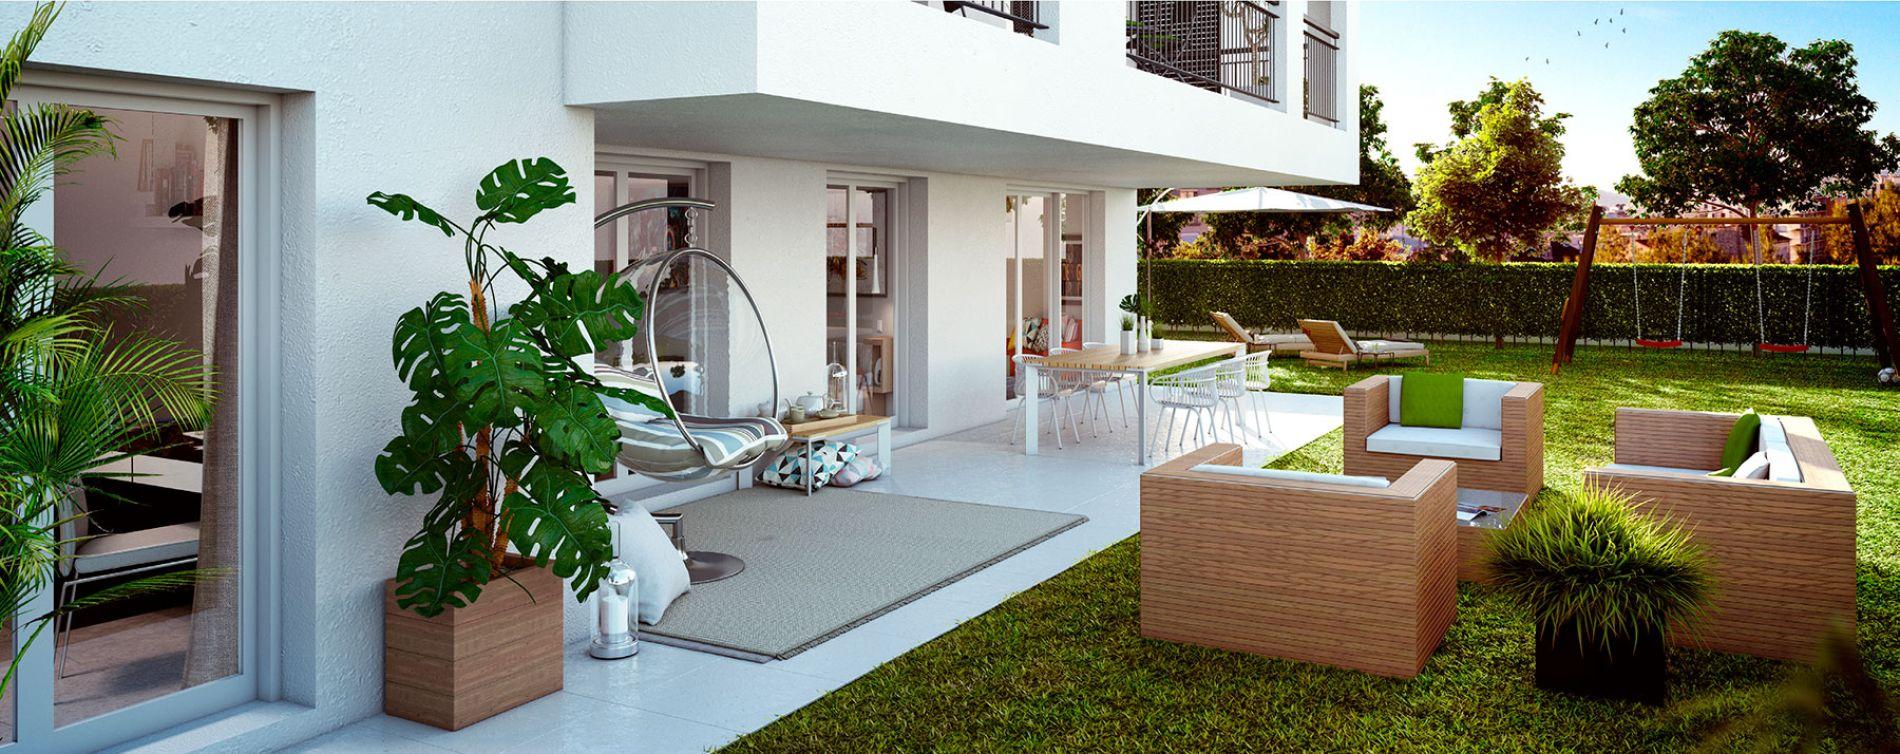 Marseille : programme immobilier neuve « Roof Garden » (4)